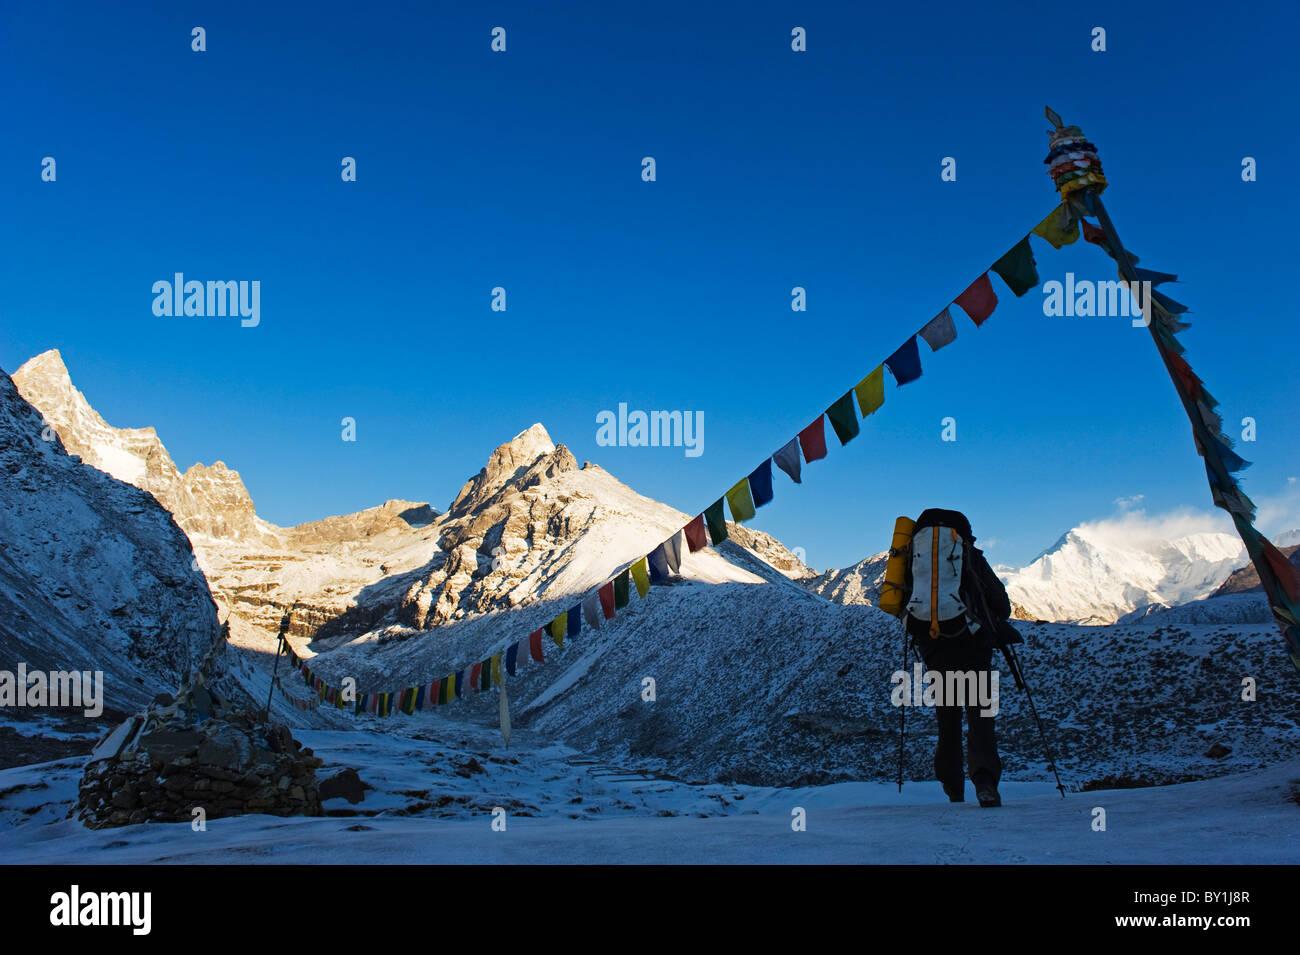 Asia, Nepal, Himalayas, Sagarmatha National Park, Solu Khumbu Everest Region, Unesco World Heritage, Machherma, - Stock Image